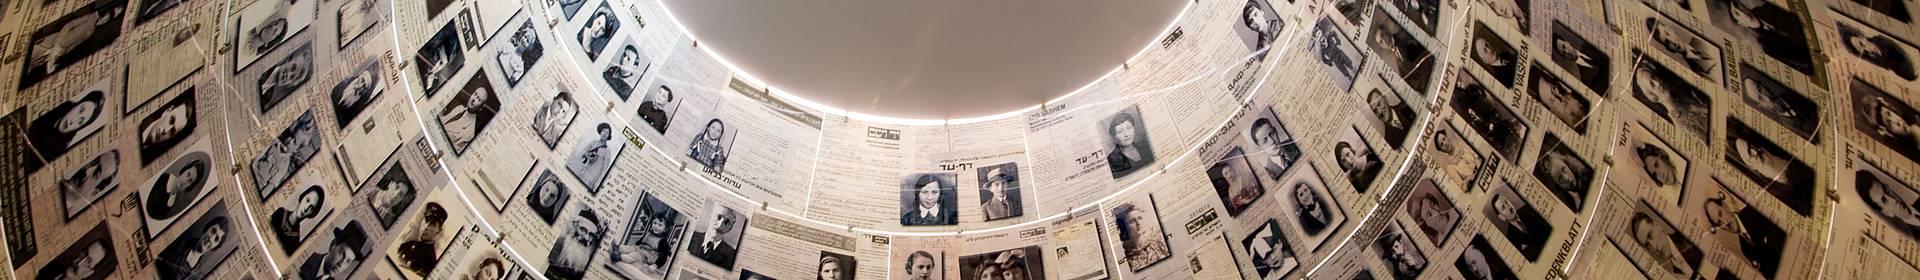 Mémorial de Yad Vashem